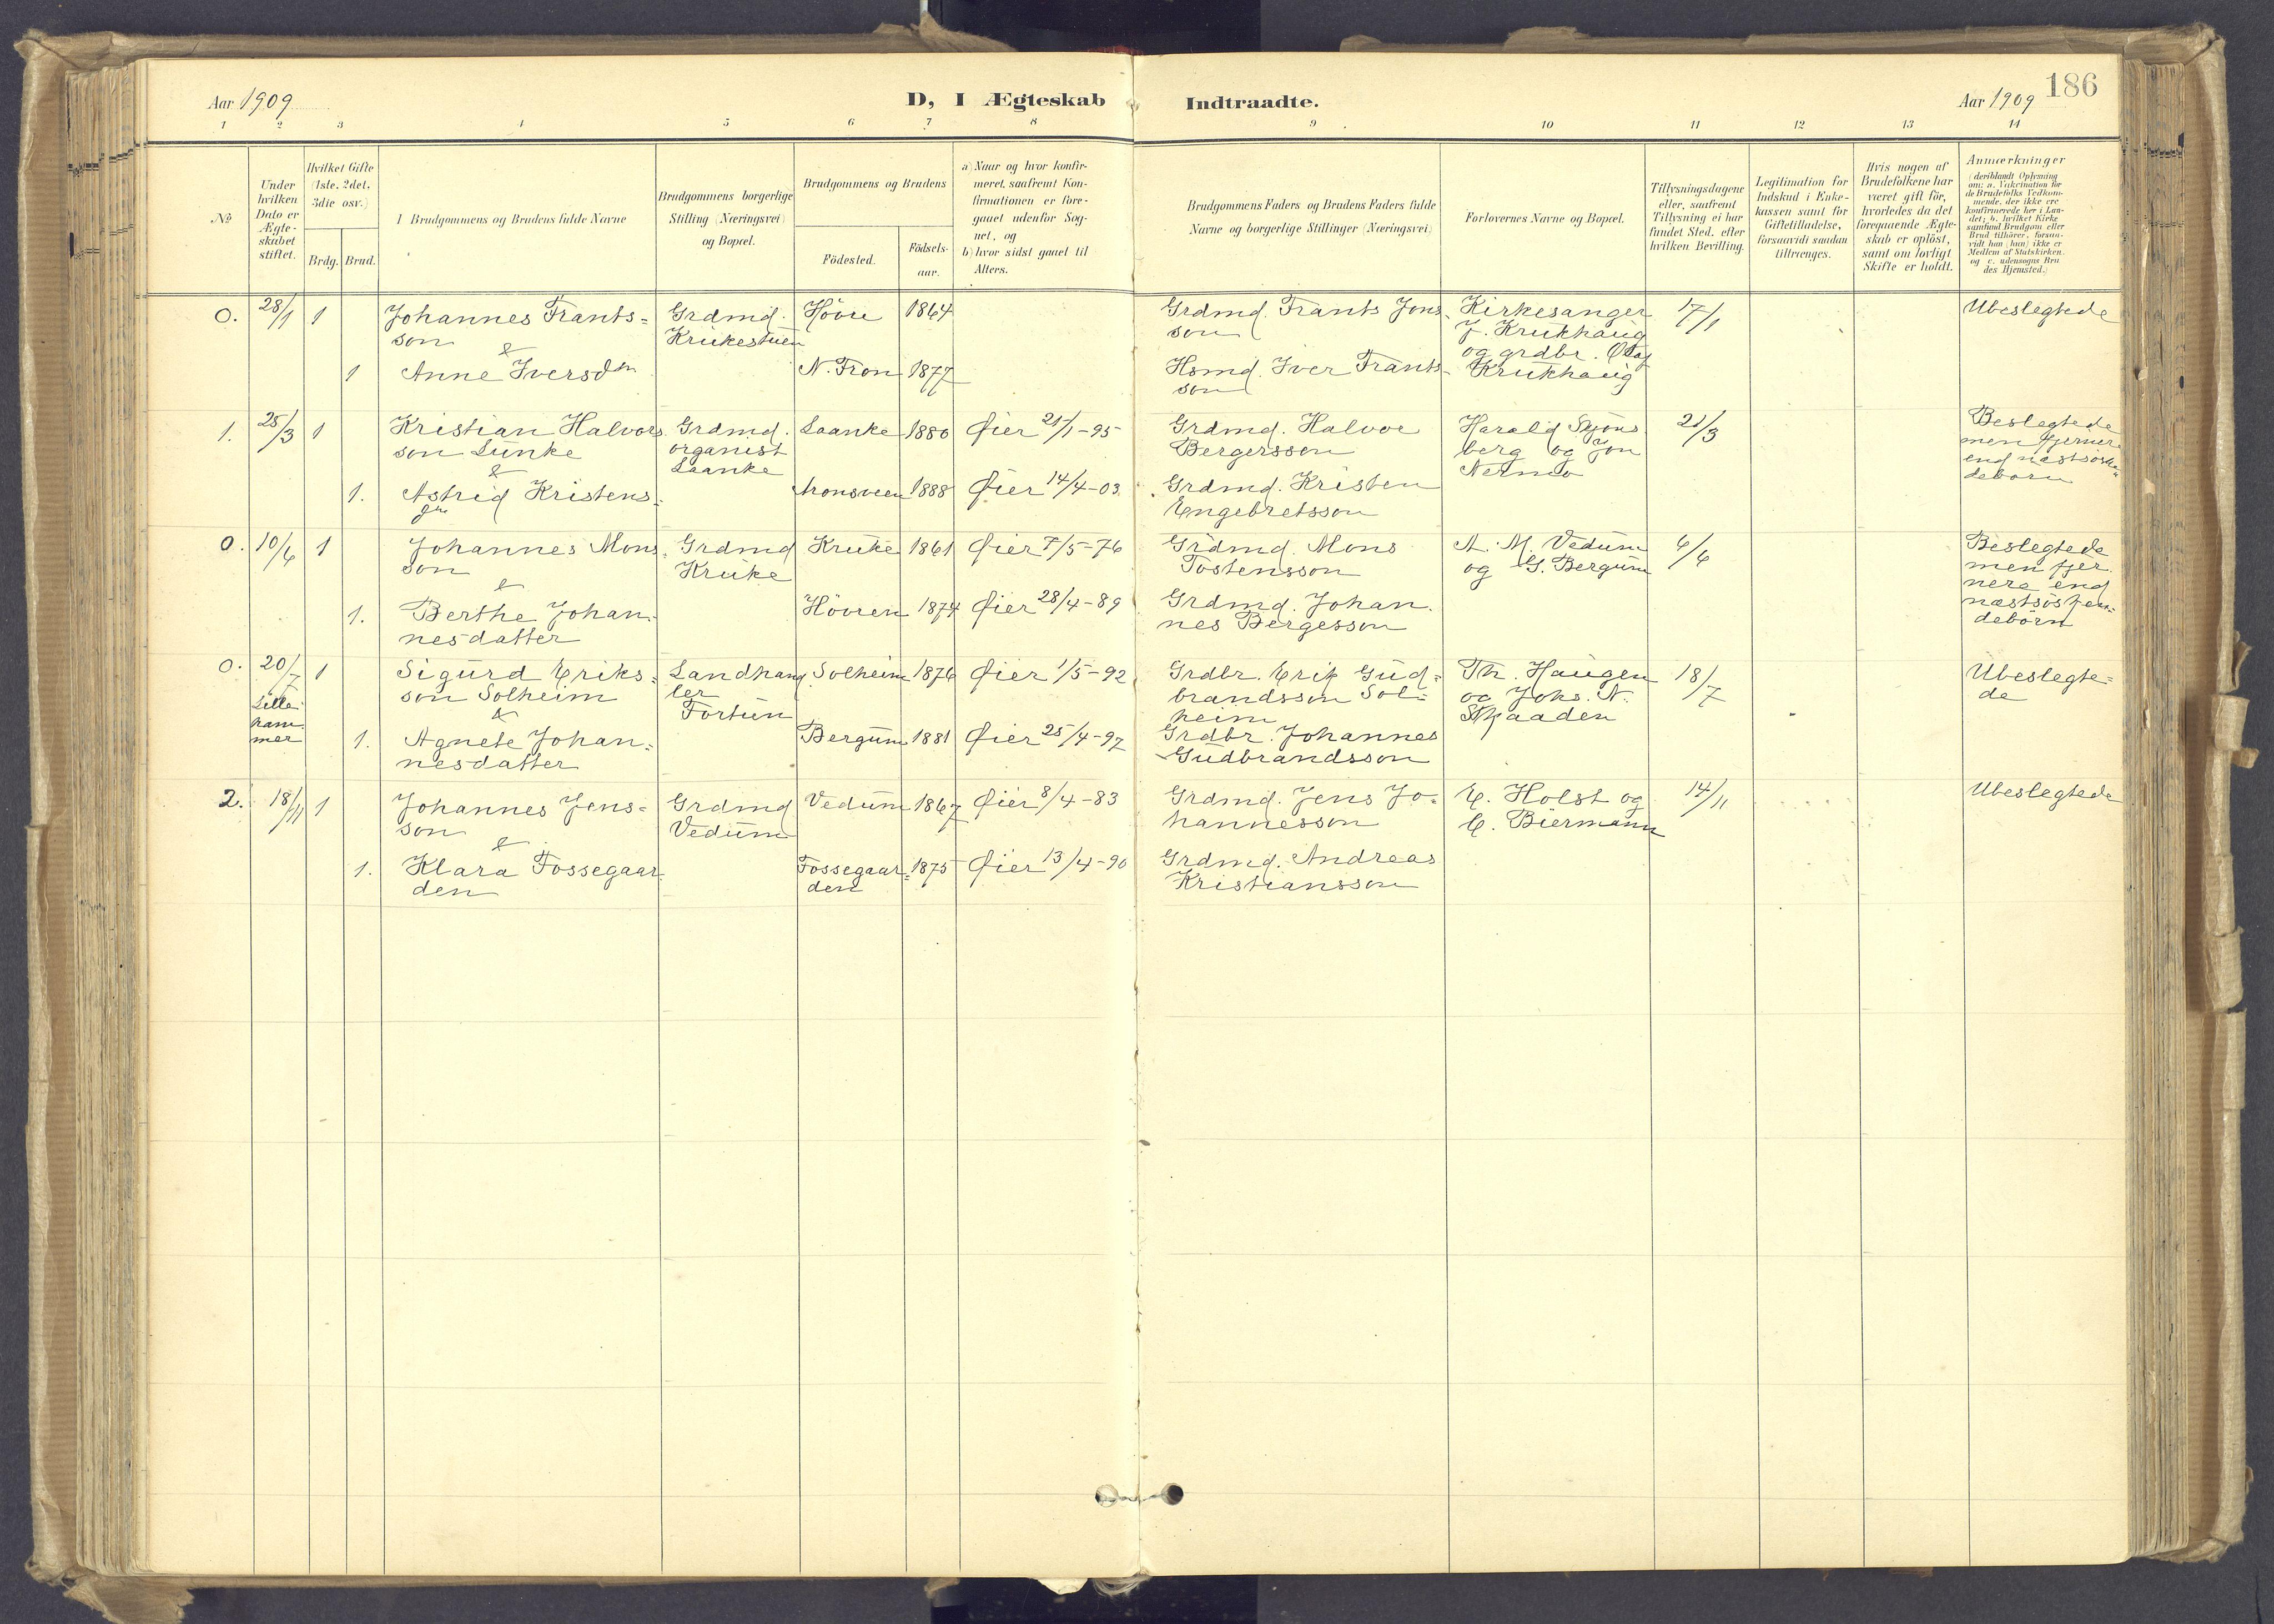 SAH, Øyer prestekontor, Ministerialbok nr. 12, 1897-1920, s. 186